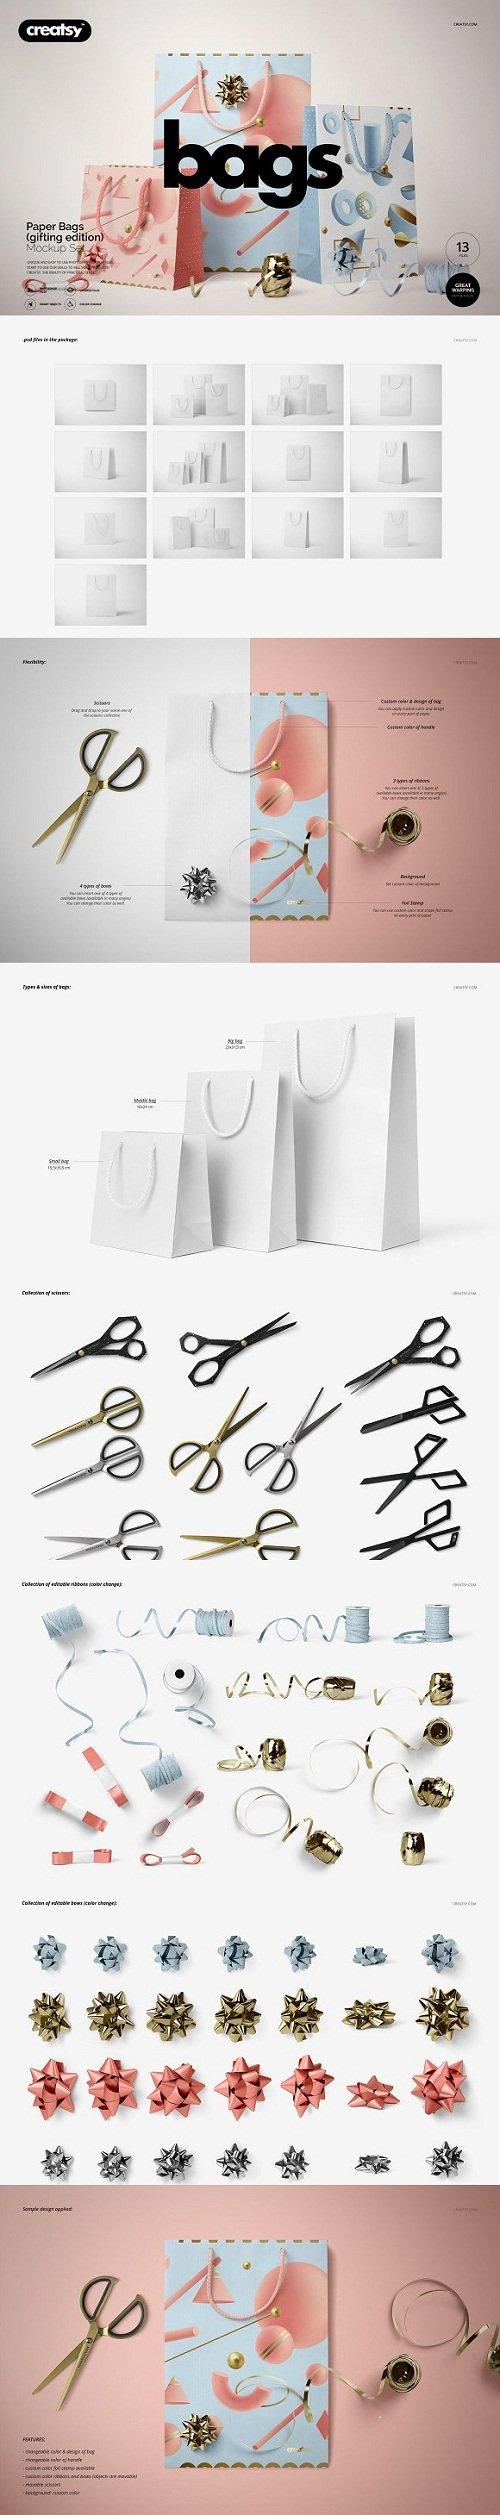 Paper Bags Mockup (gifting edition) - 3439321